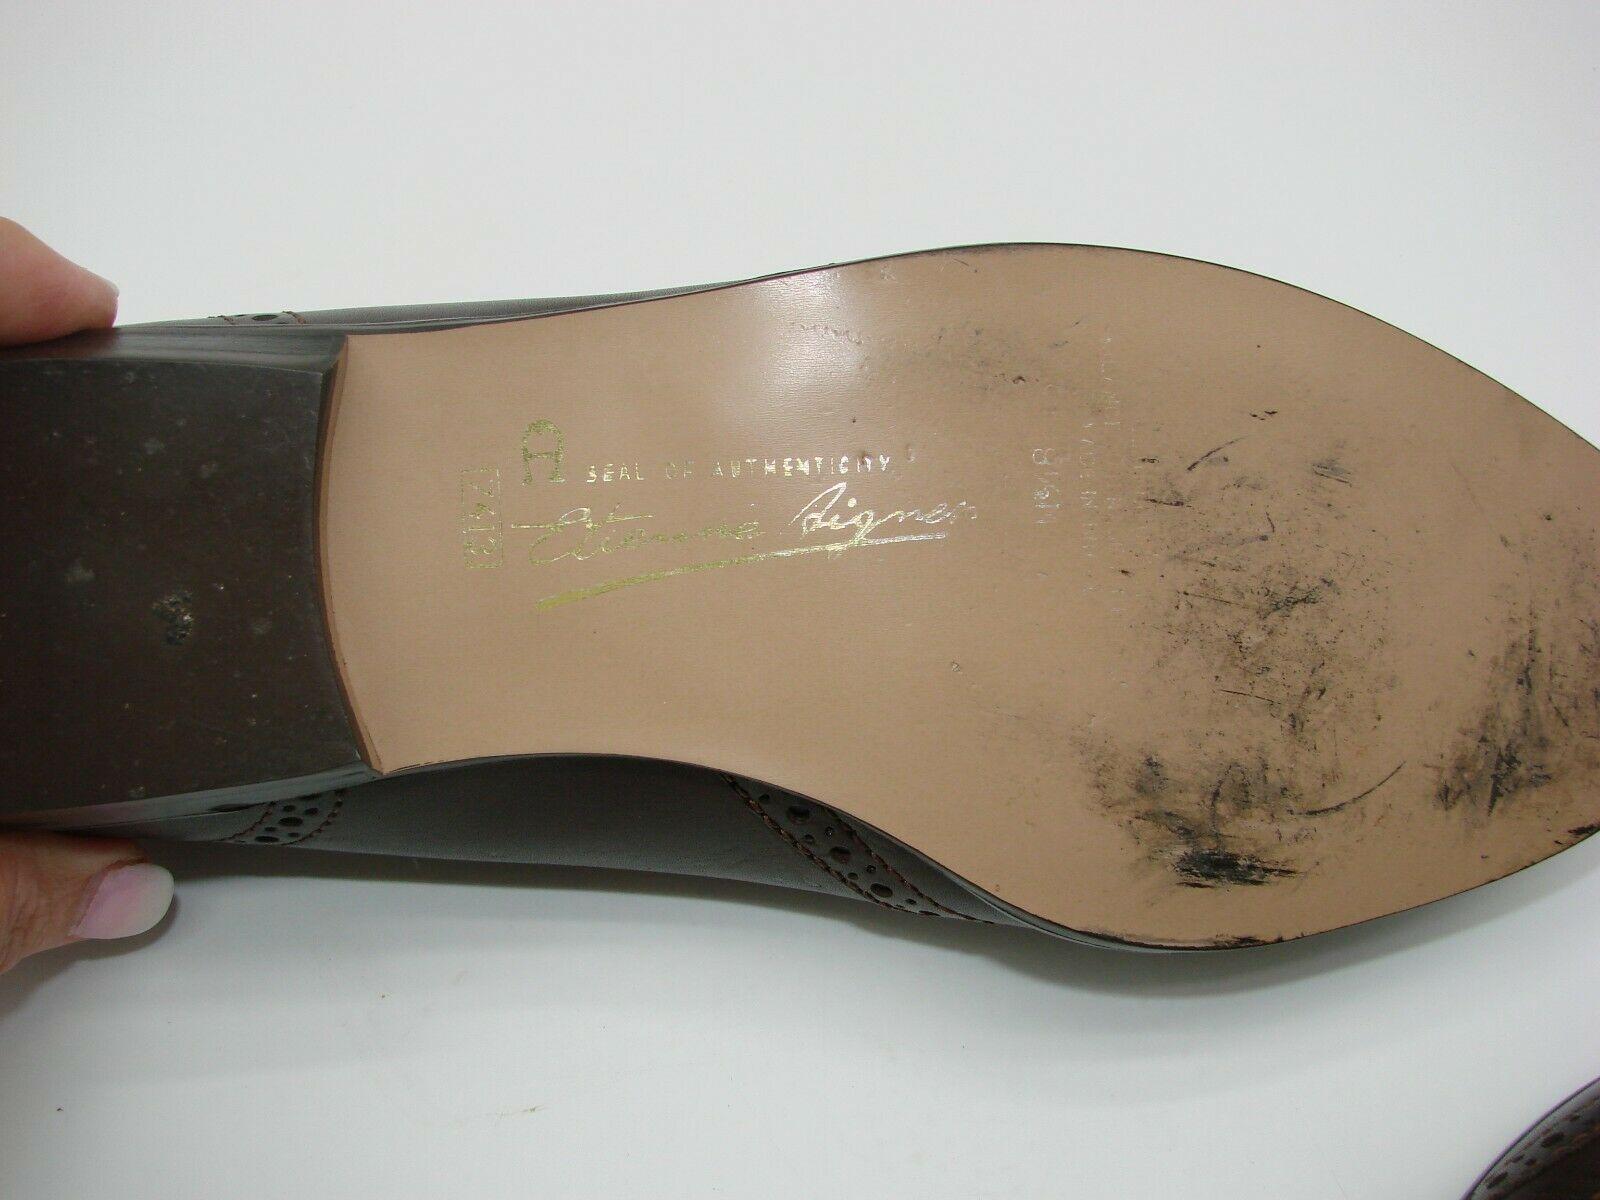 EUC Etienne Aigner Women's Tassel Slip On Pinch Loafers Dress 8 1/2M Brown image 2